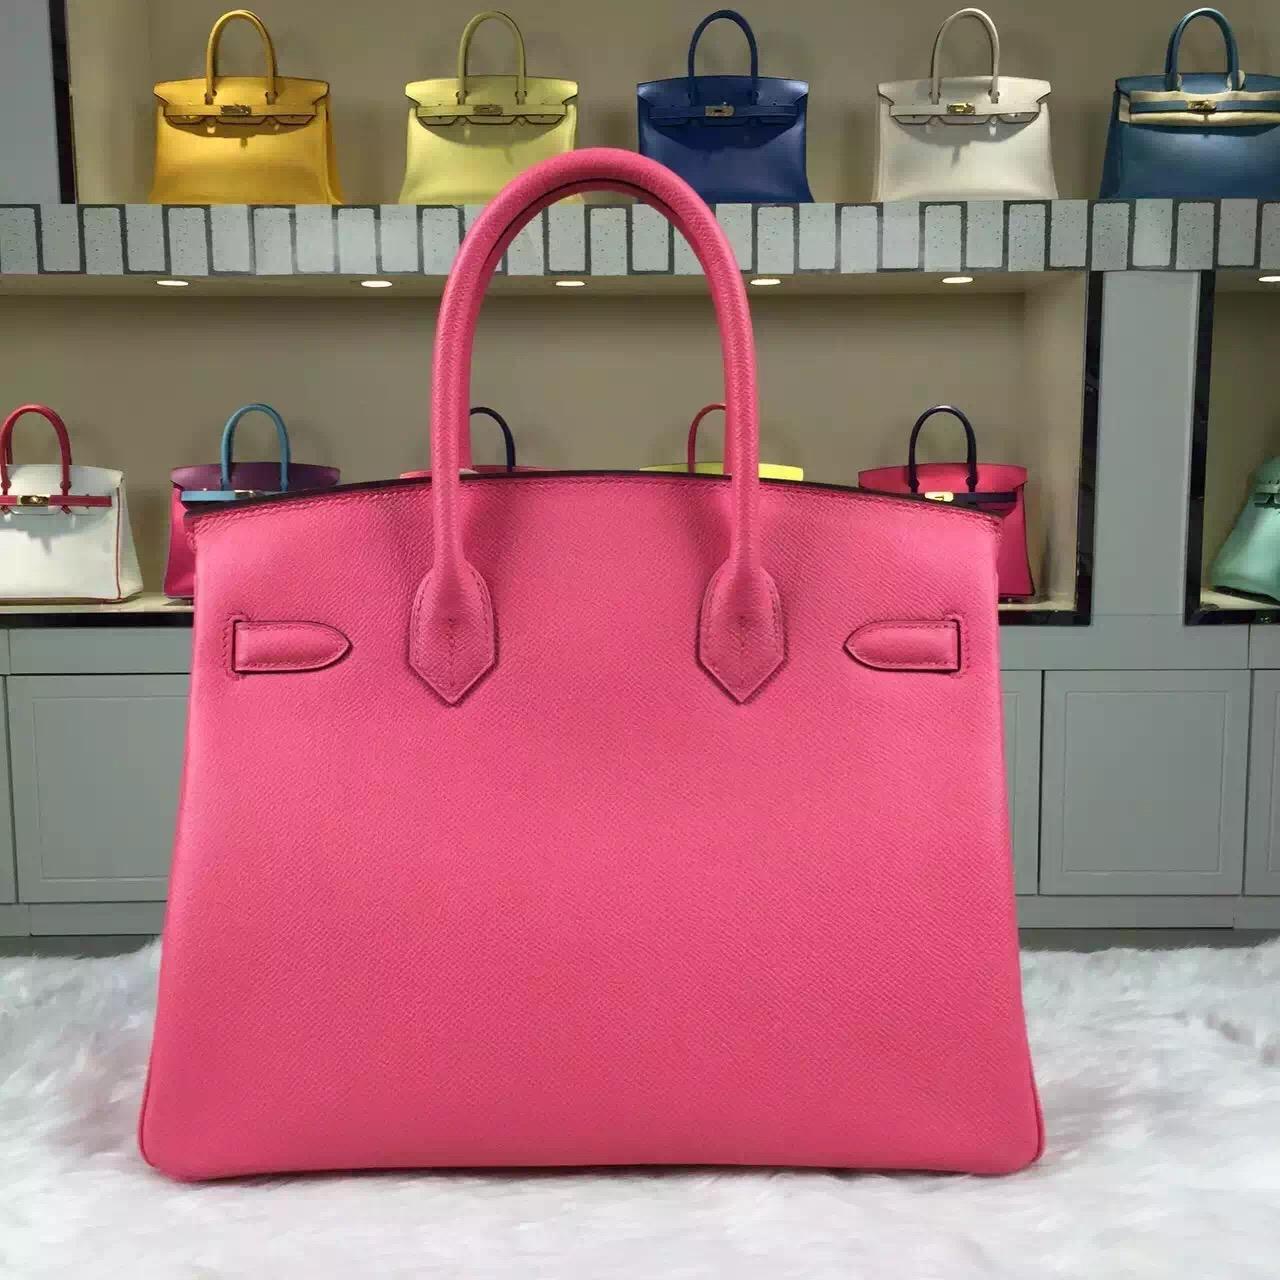 New Pretty Hermes Epsom Leather Birkin Bag30cm in 8W Rose Azalee